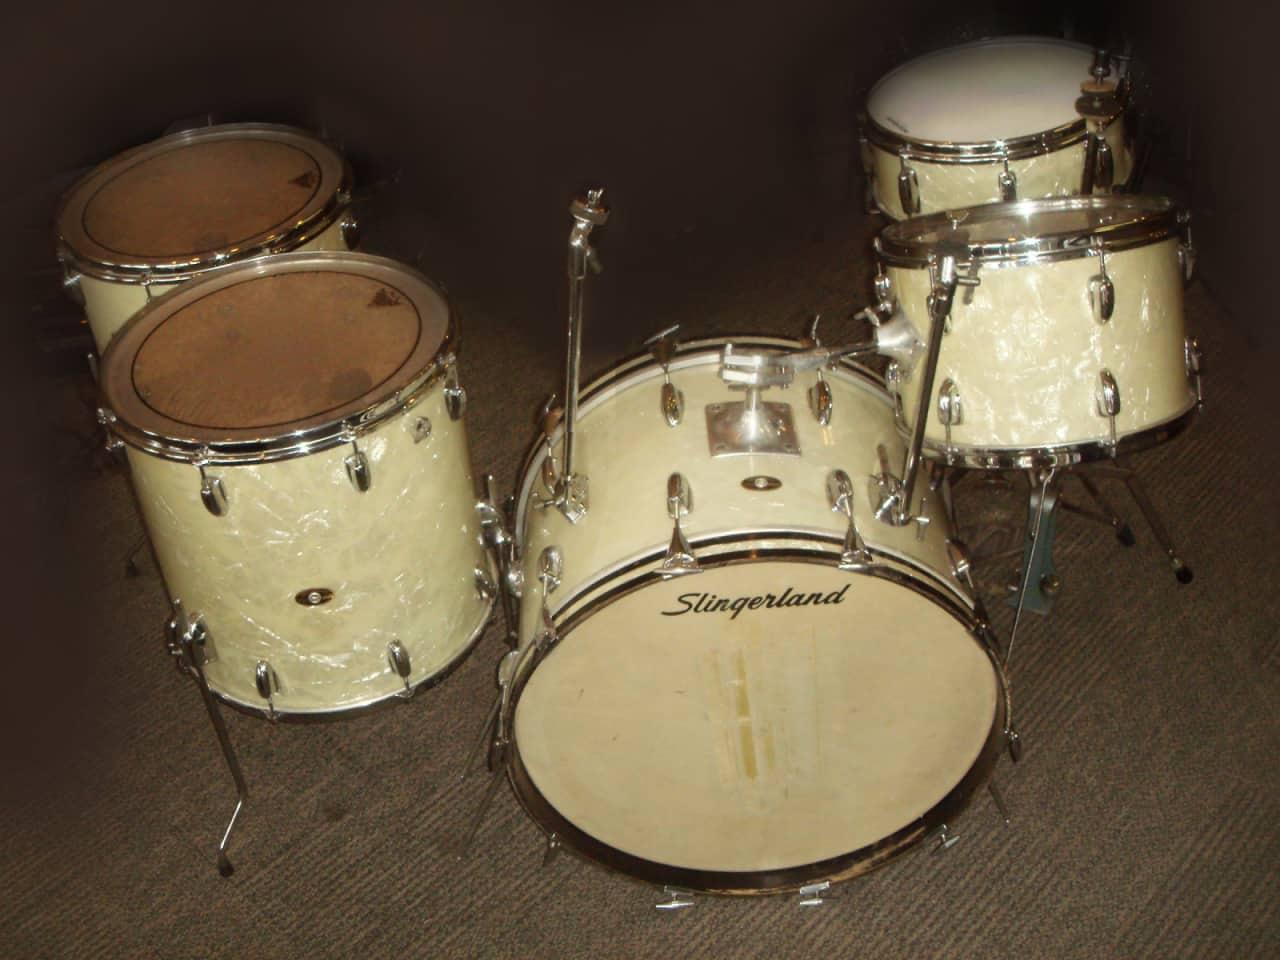 slingerland 1969 white marine pearl 5 pc drum set buddy reverb. Black Bedroom Furniture Sets. Home Design Ideas